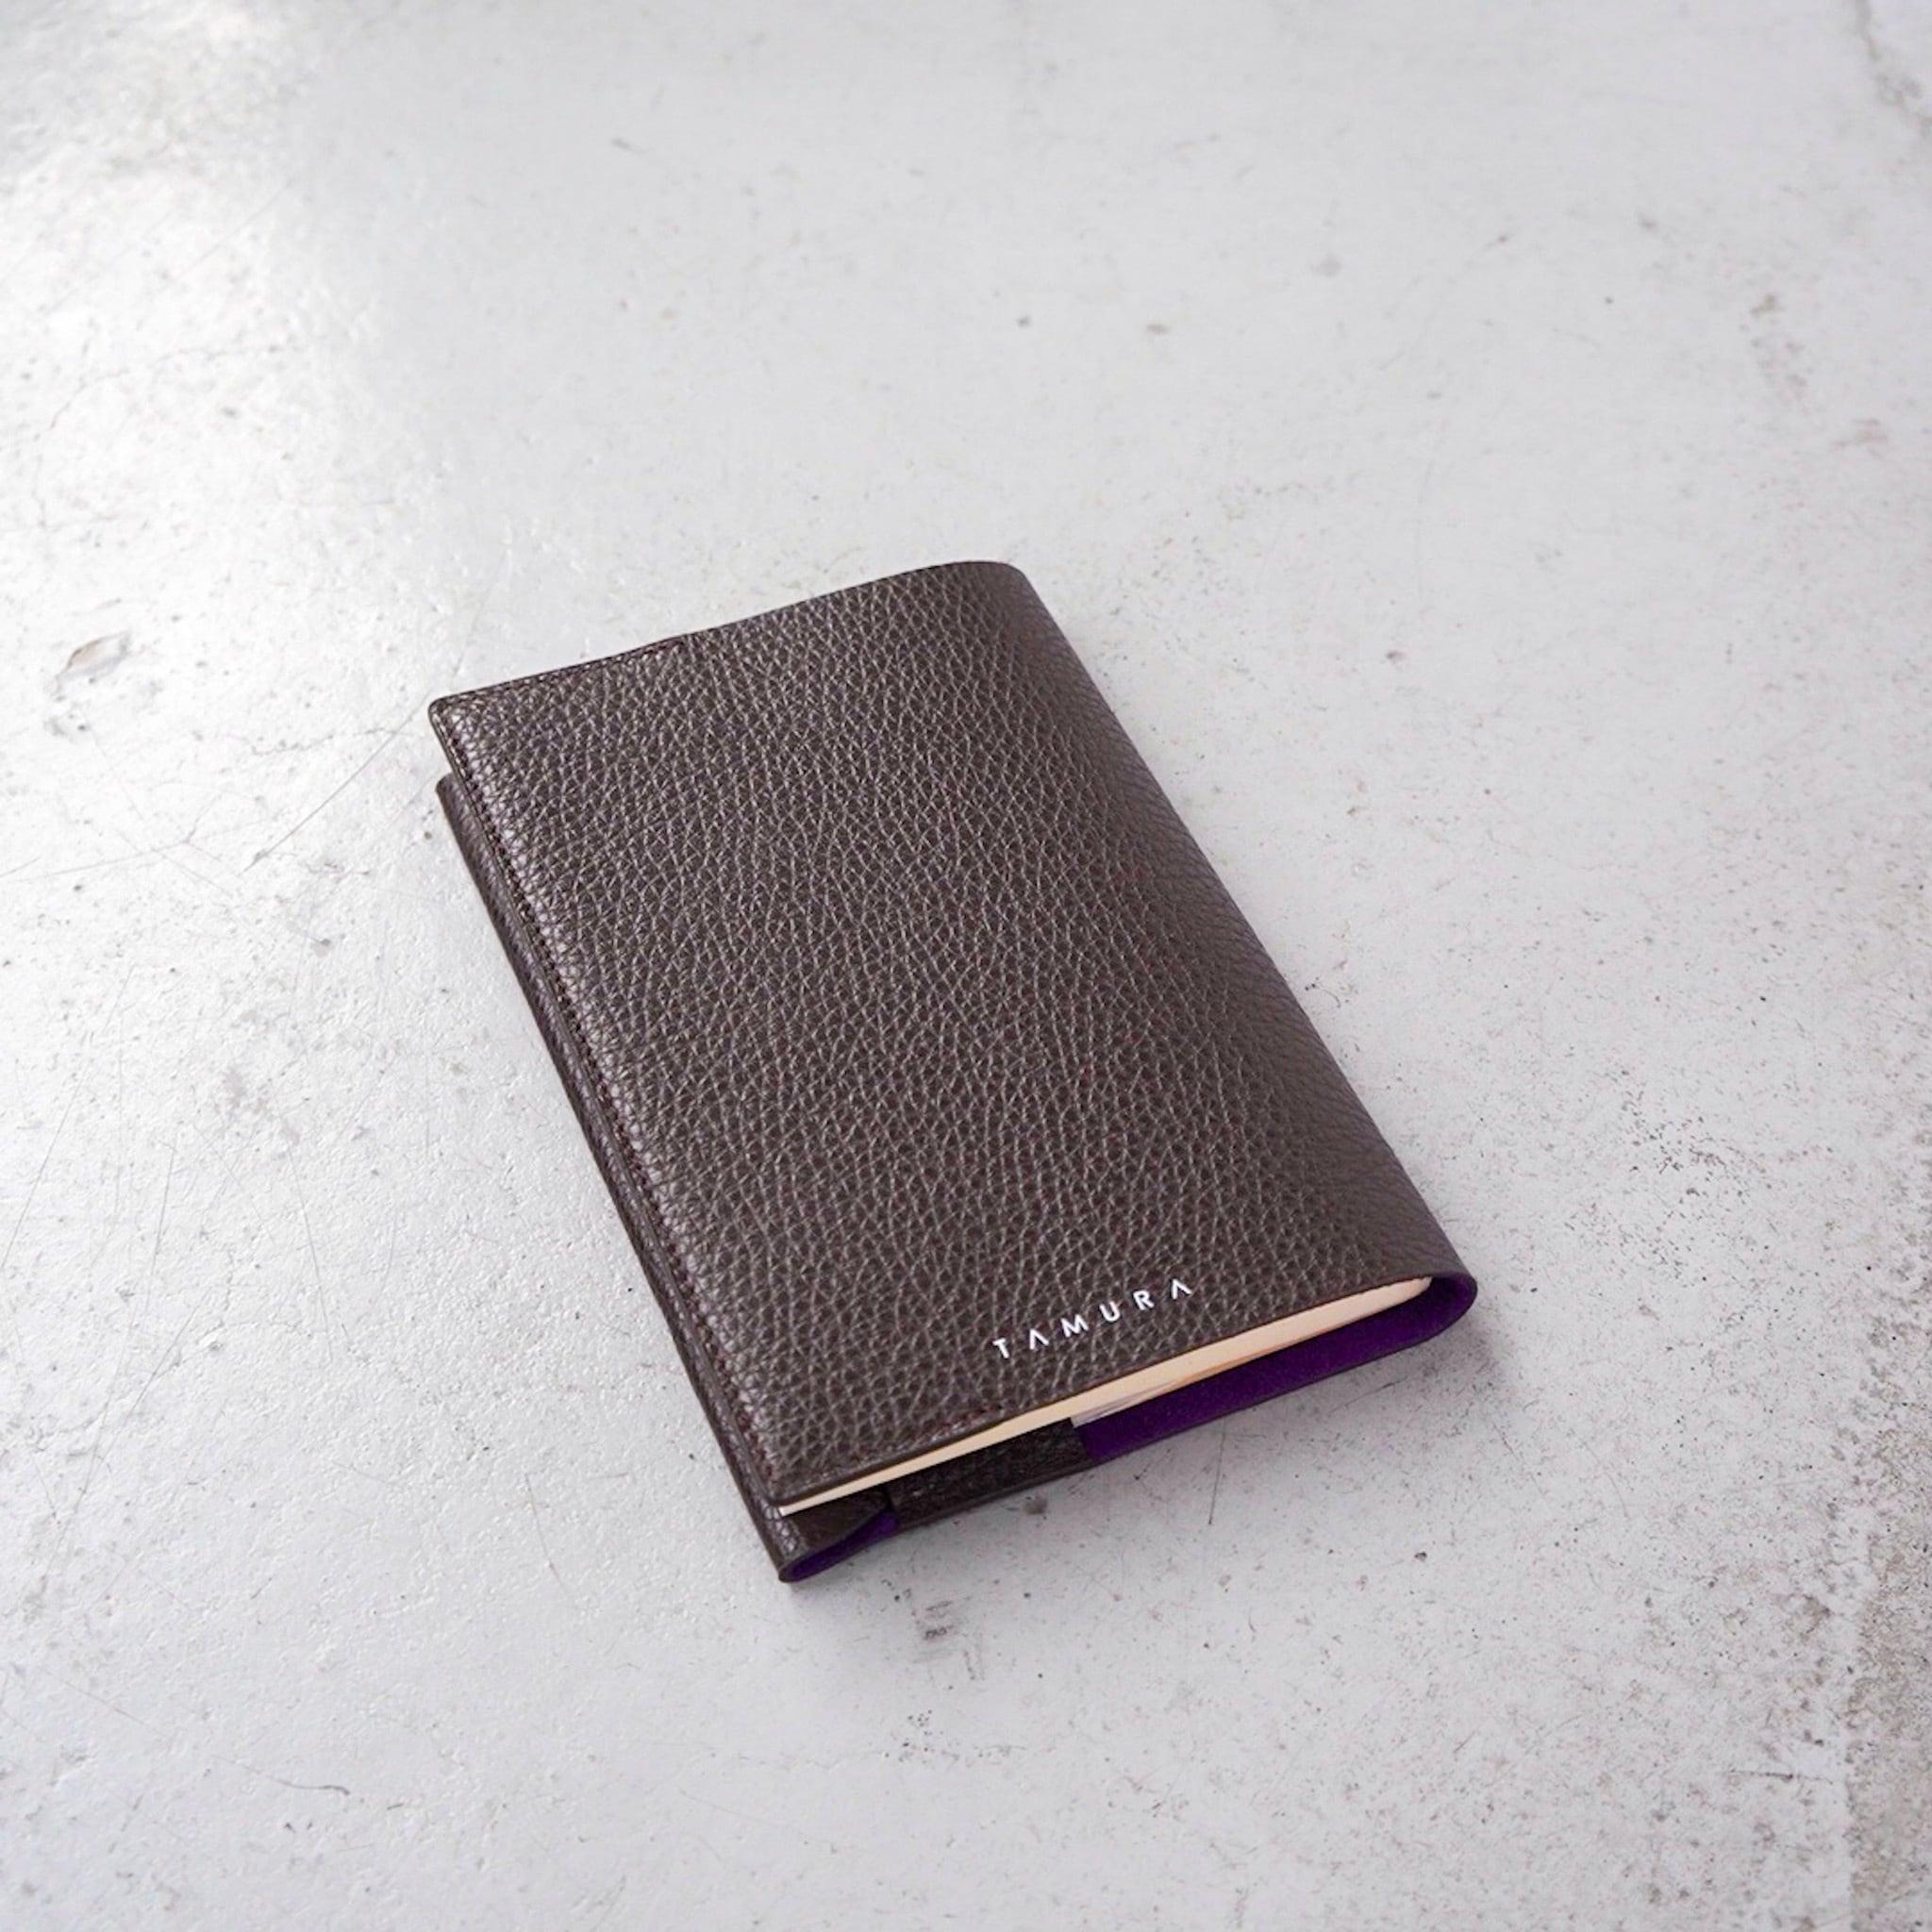 BOOK COVER(文庫サイズ)チョコレート × パープル